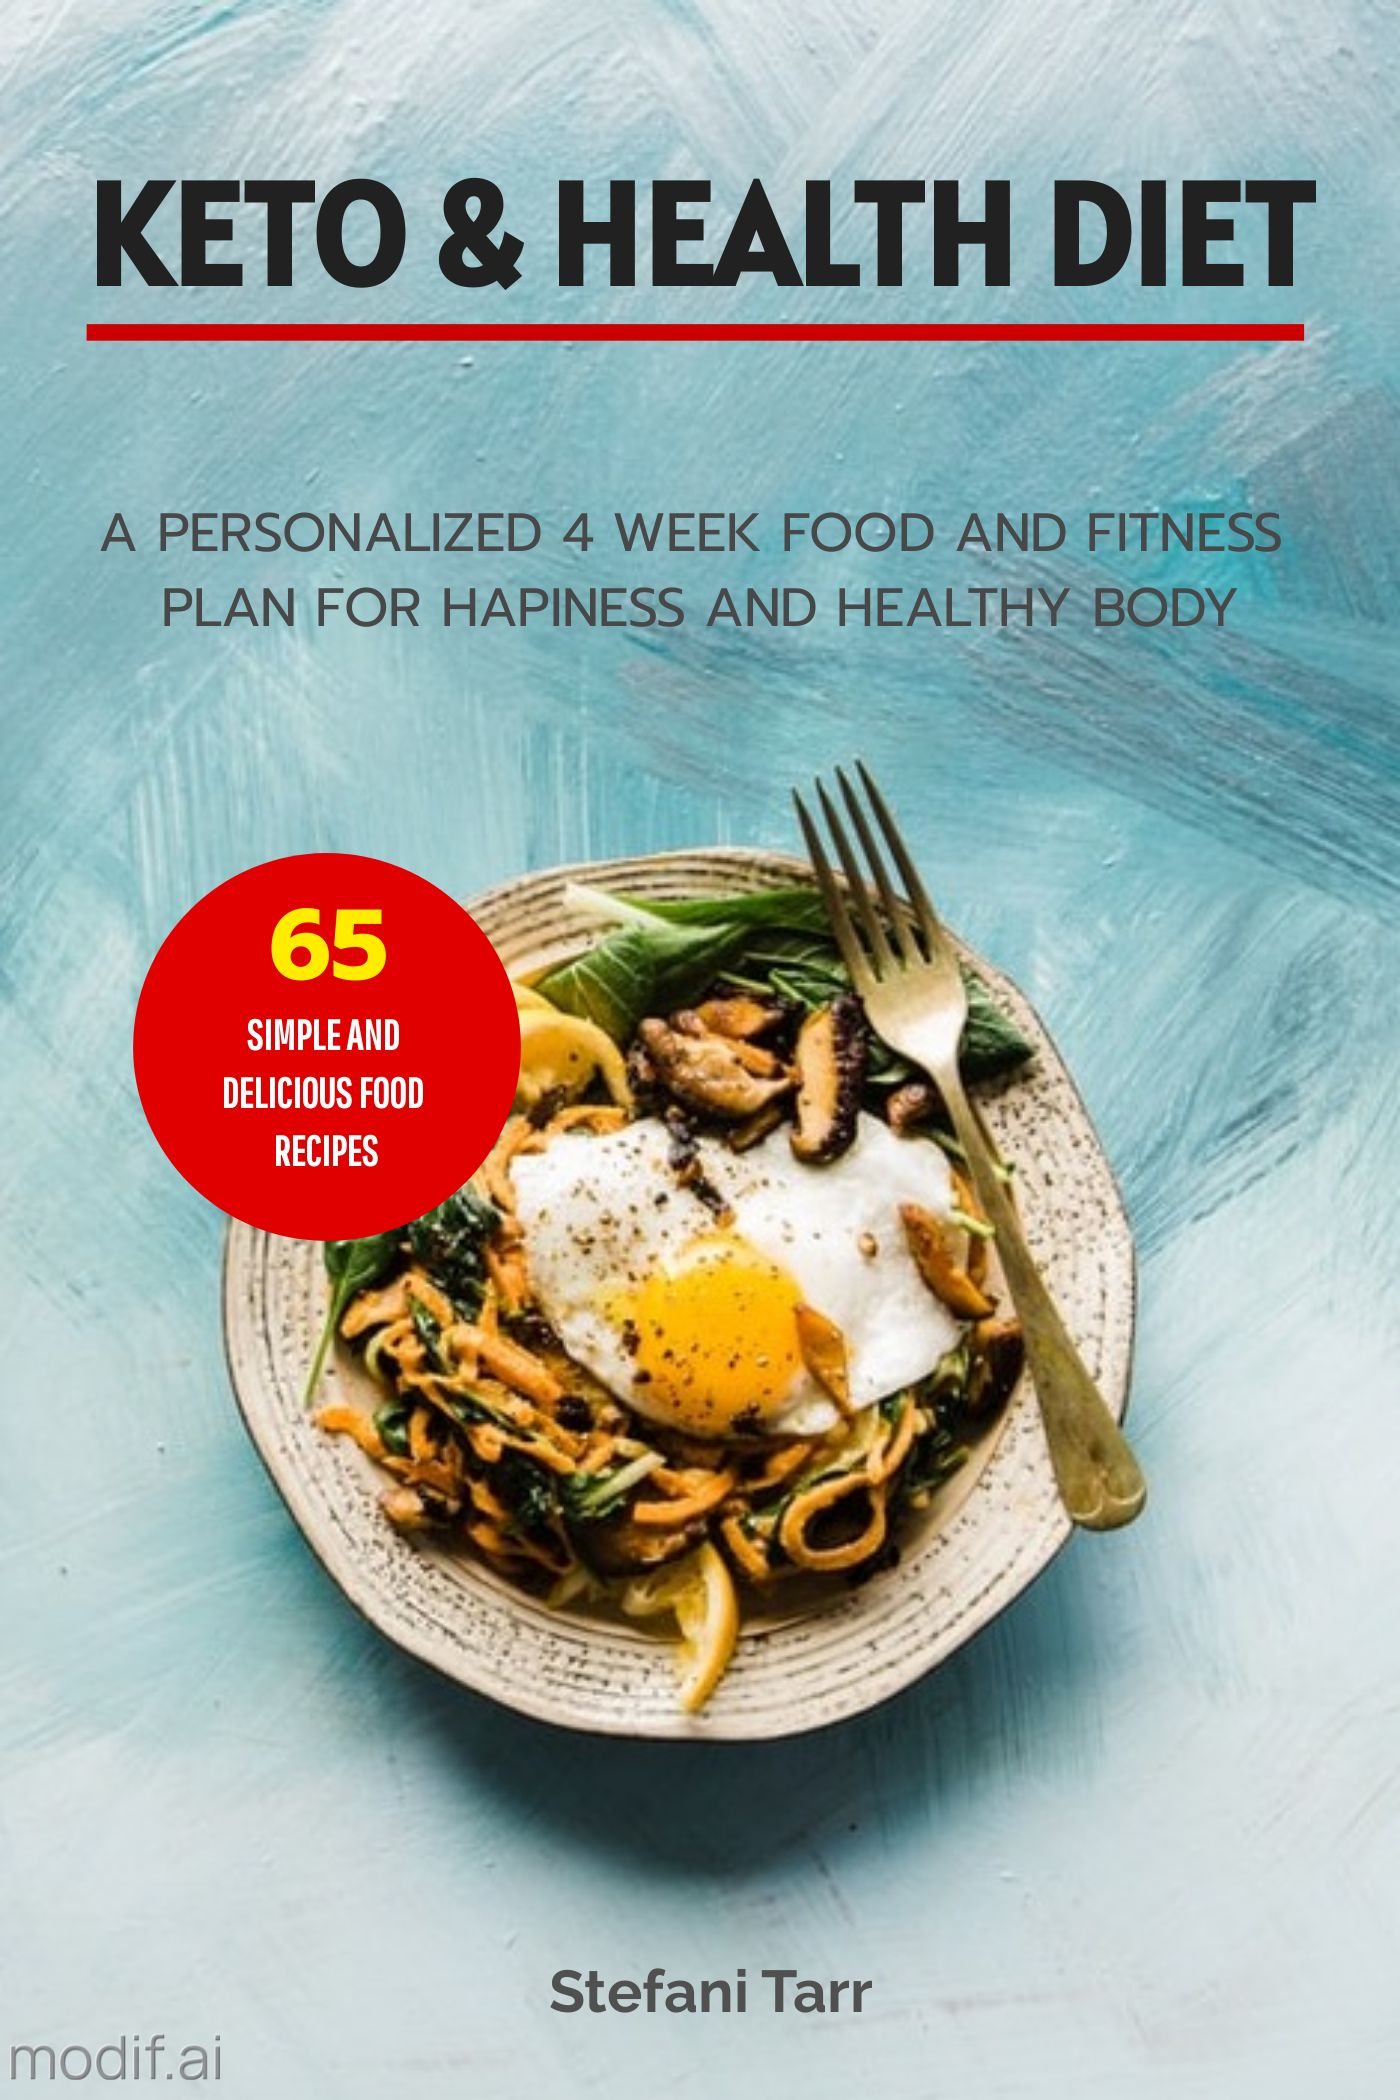 Healthy Recipe Book Cover Template